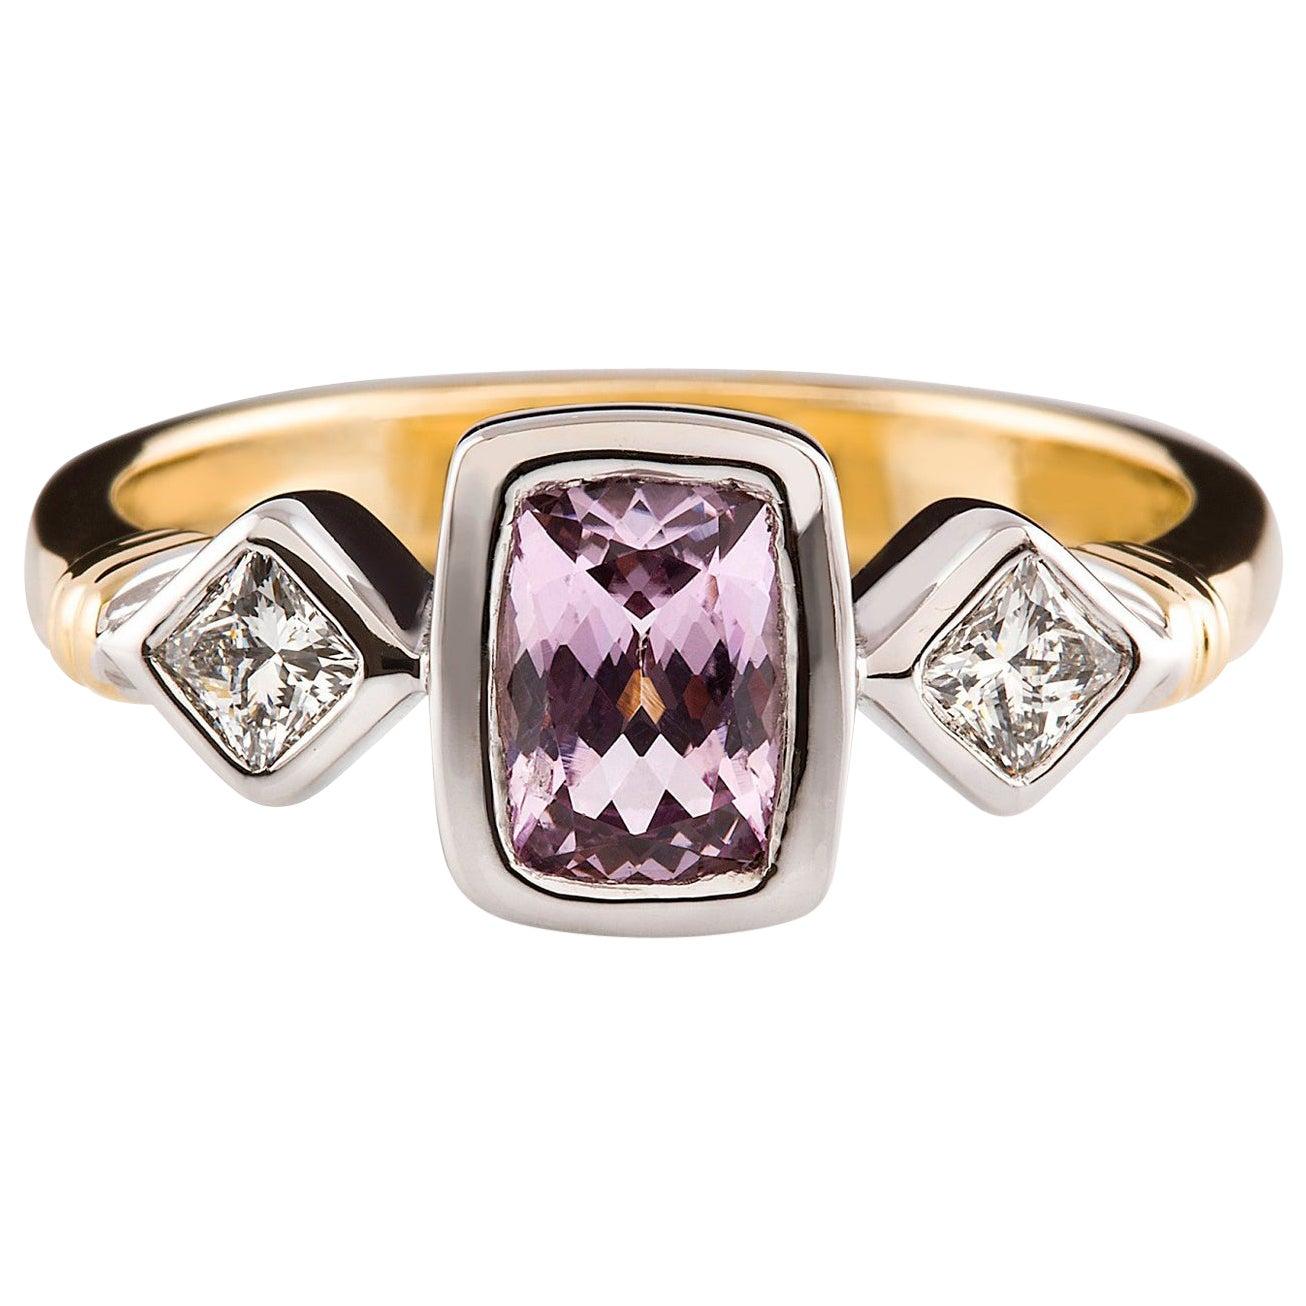 Cushion Cut 1.04 Carat Pink Sapphire and Diamond Engagement Ring 18 Carat Gold